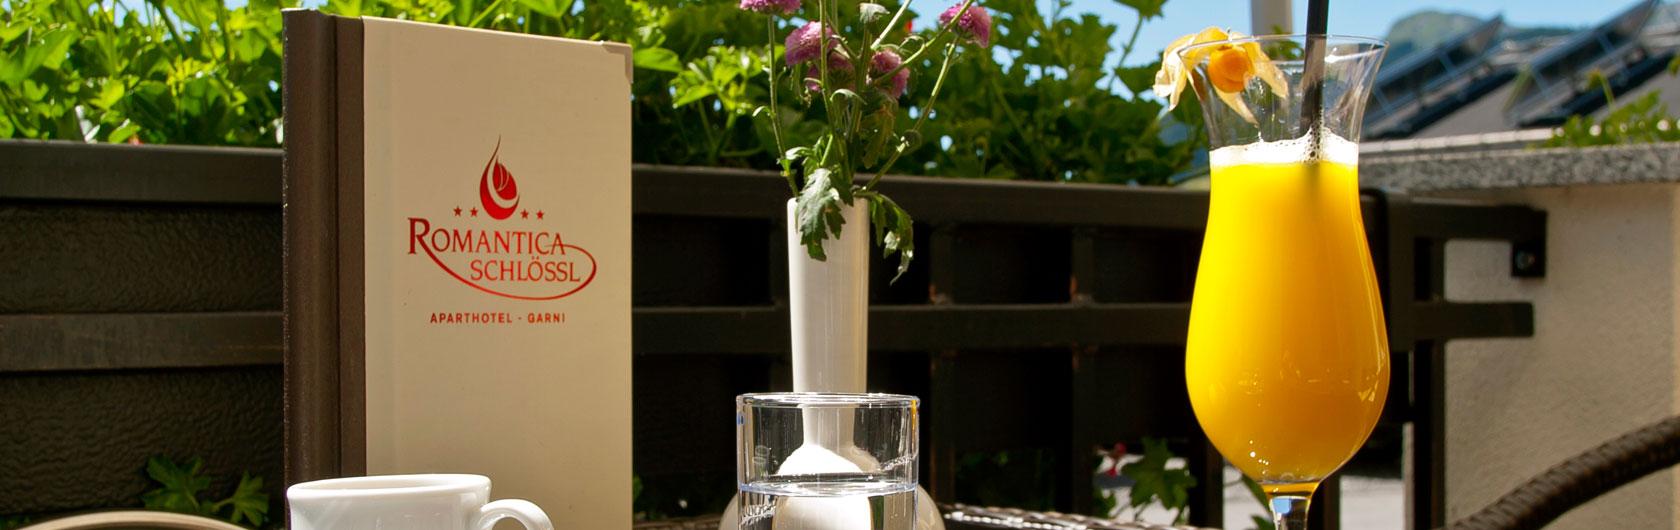 Romantica Schlössl Apart Hotel Garni in Fiss - Hausbar Romantica Geiger